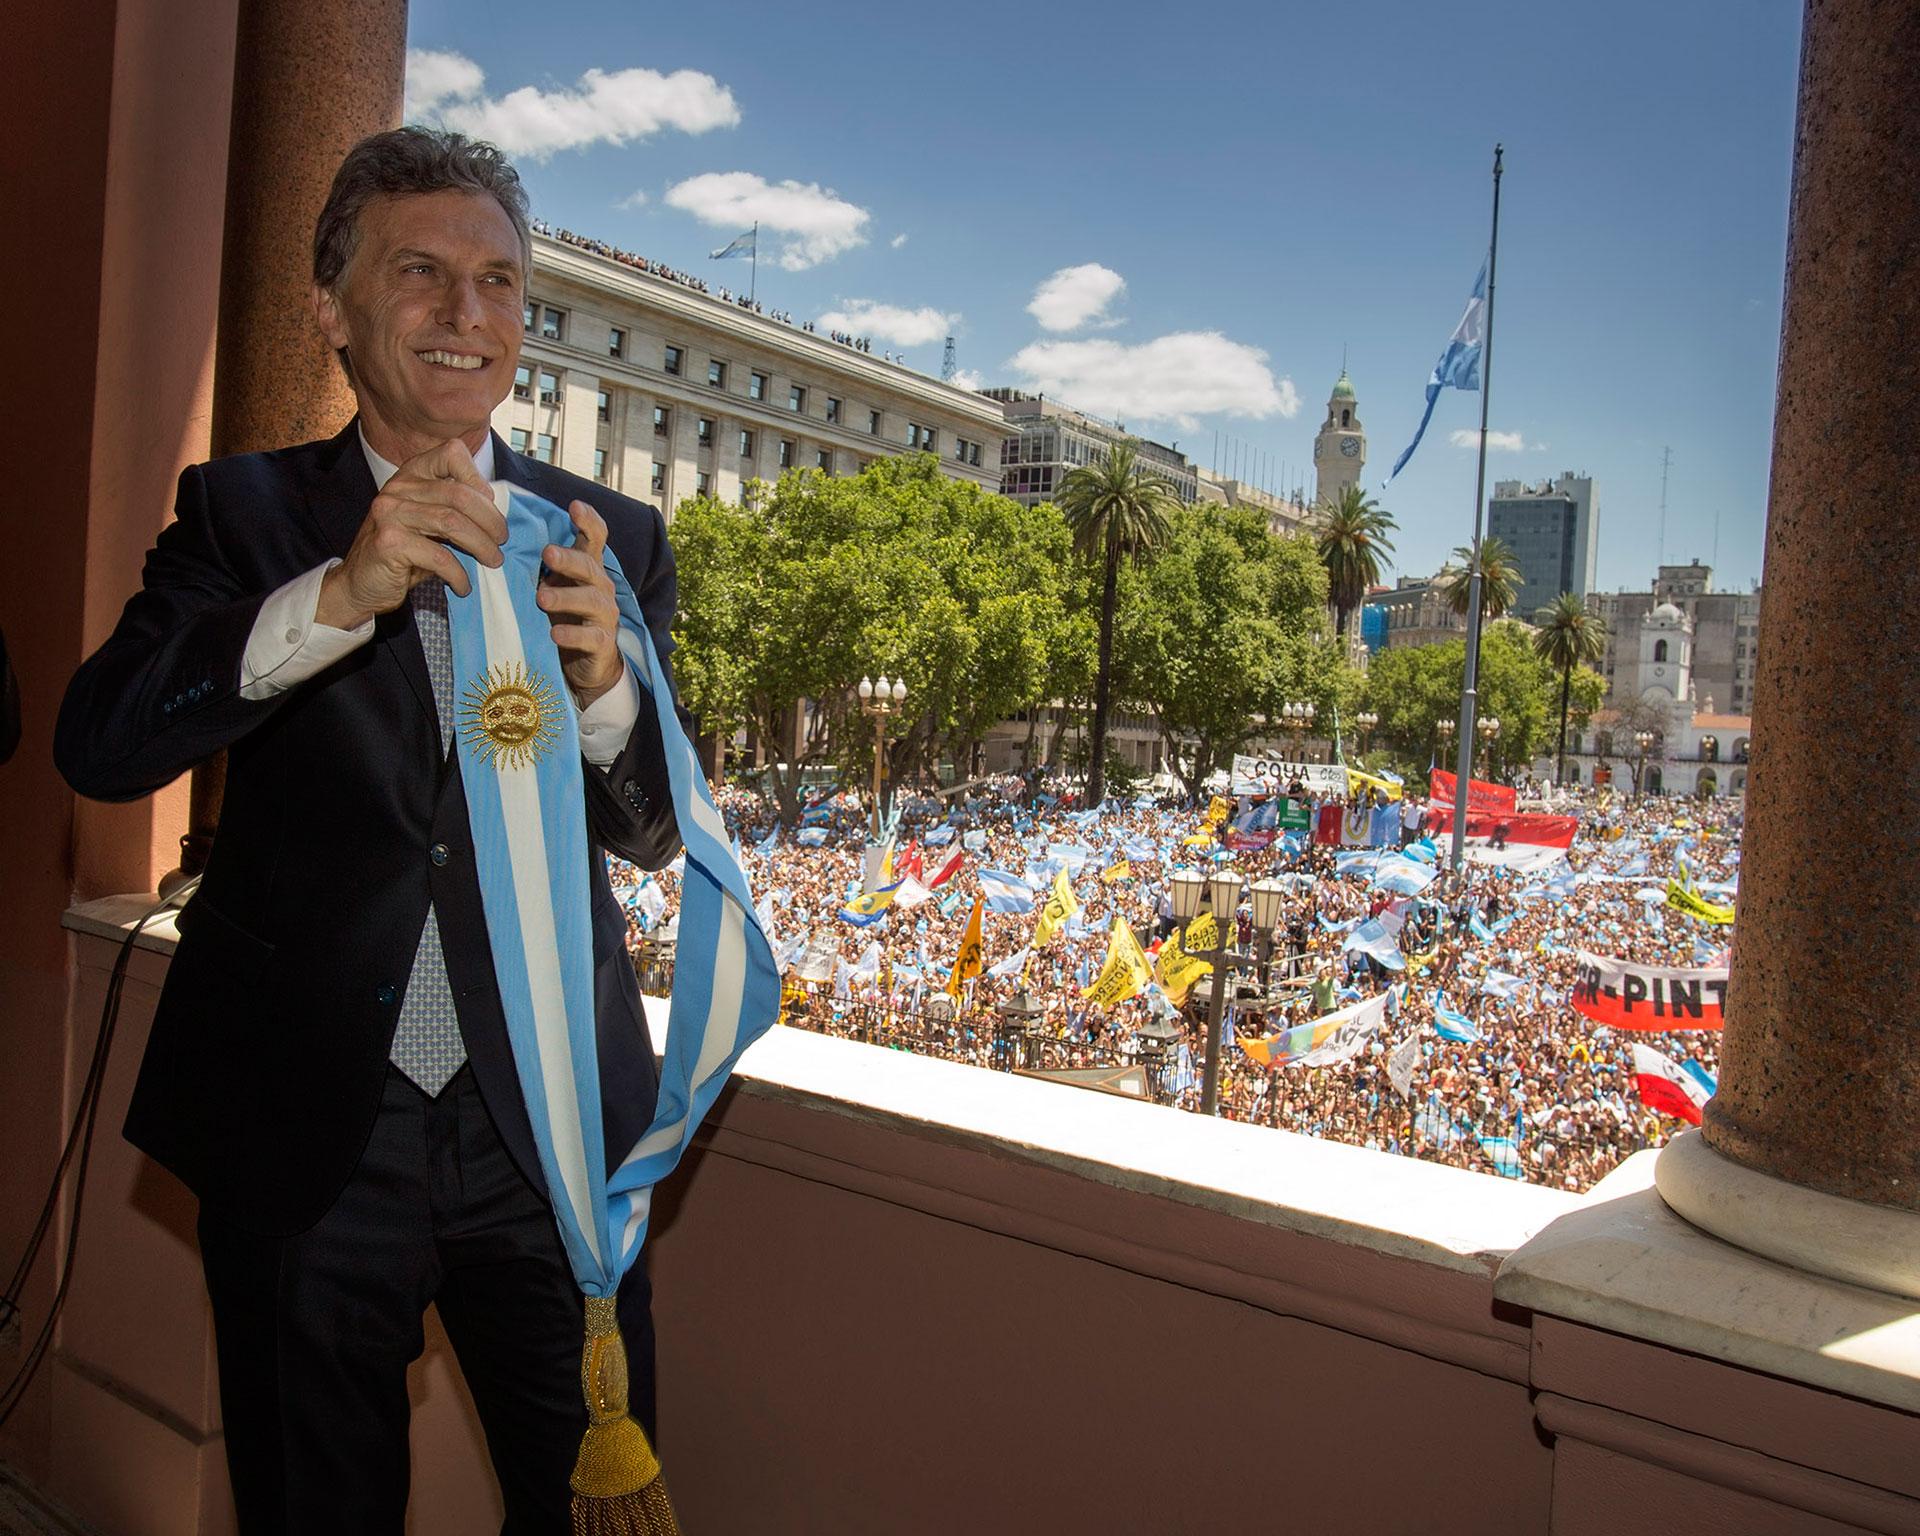 Macrì, il presidente calabrese dell'Argentina